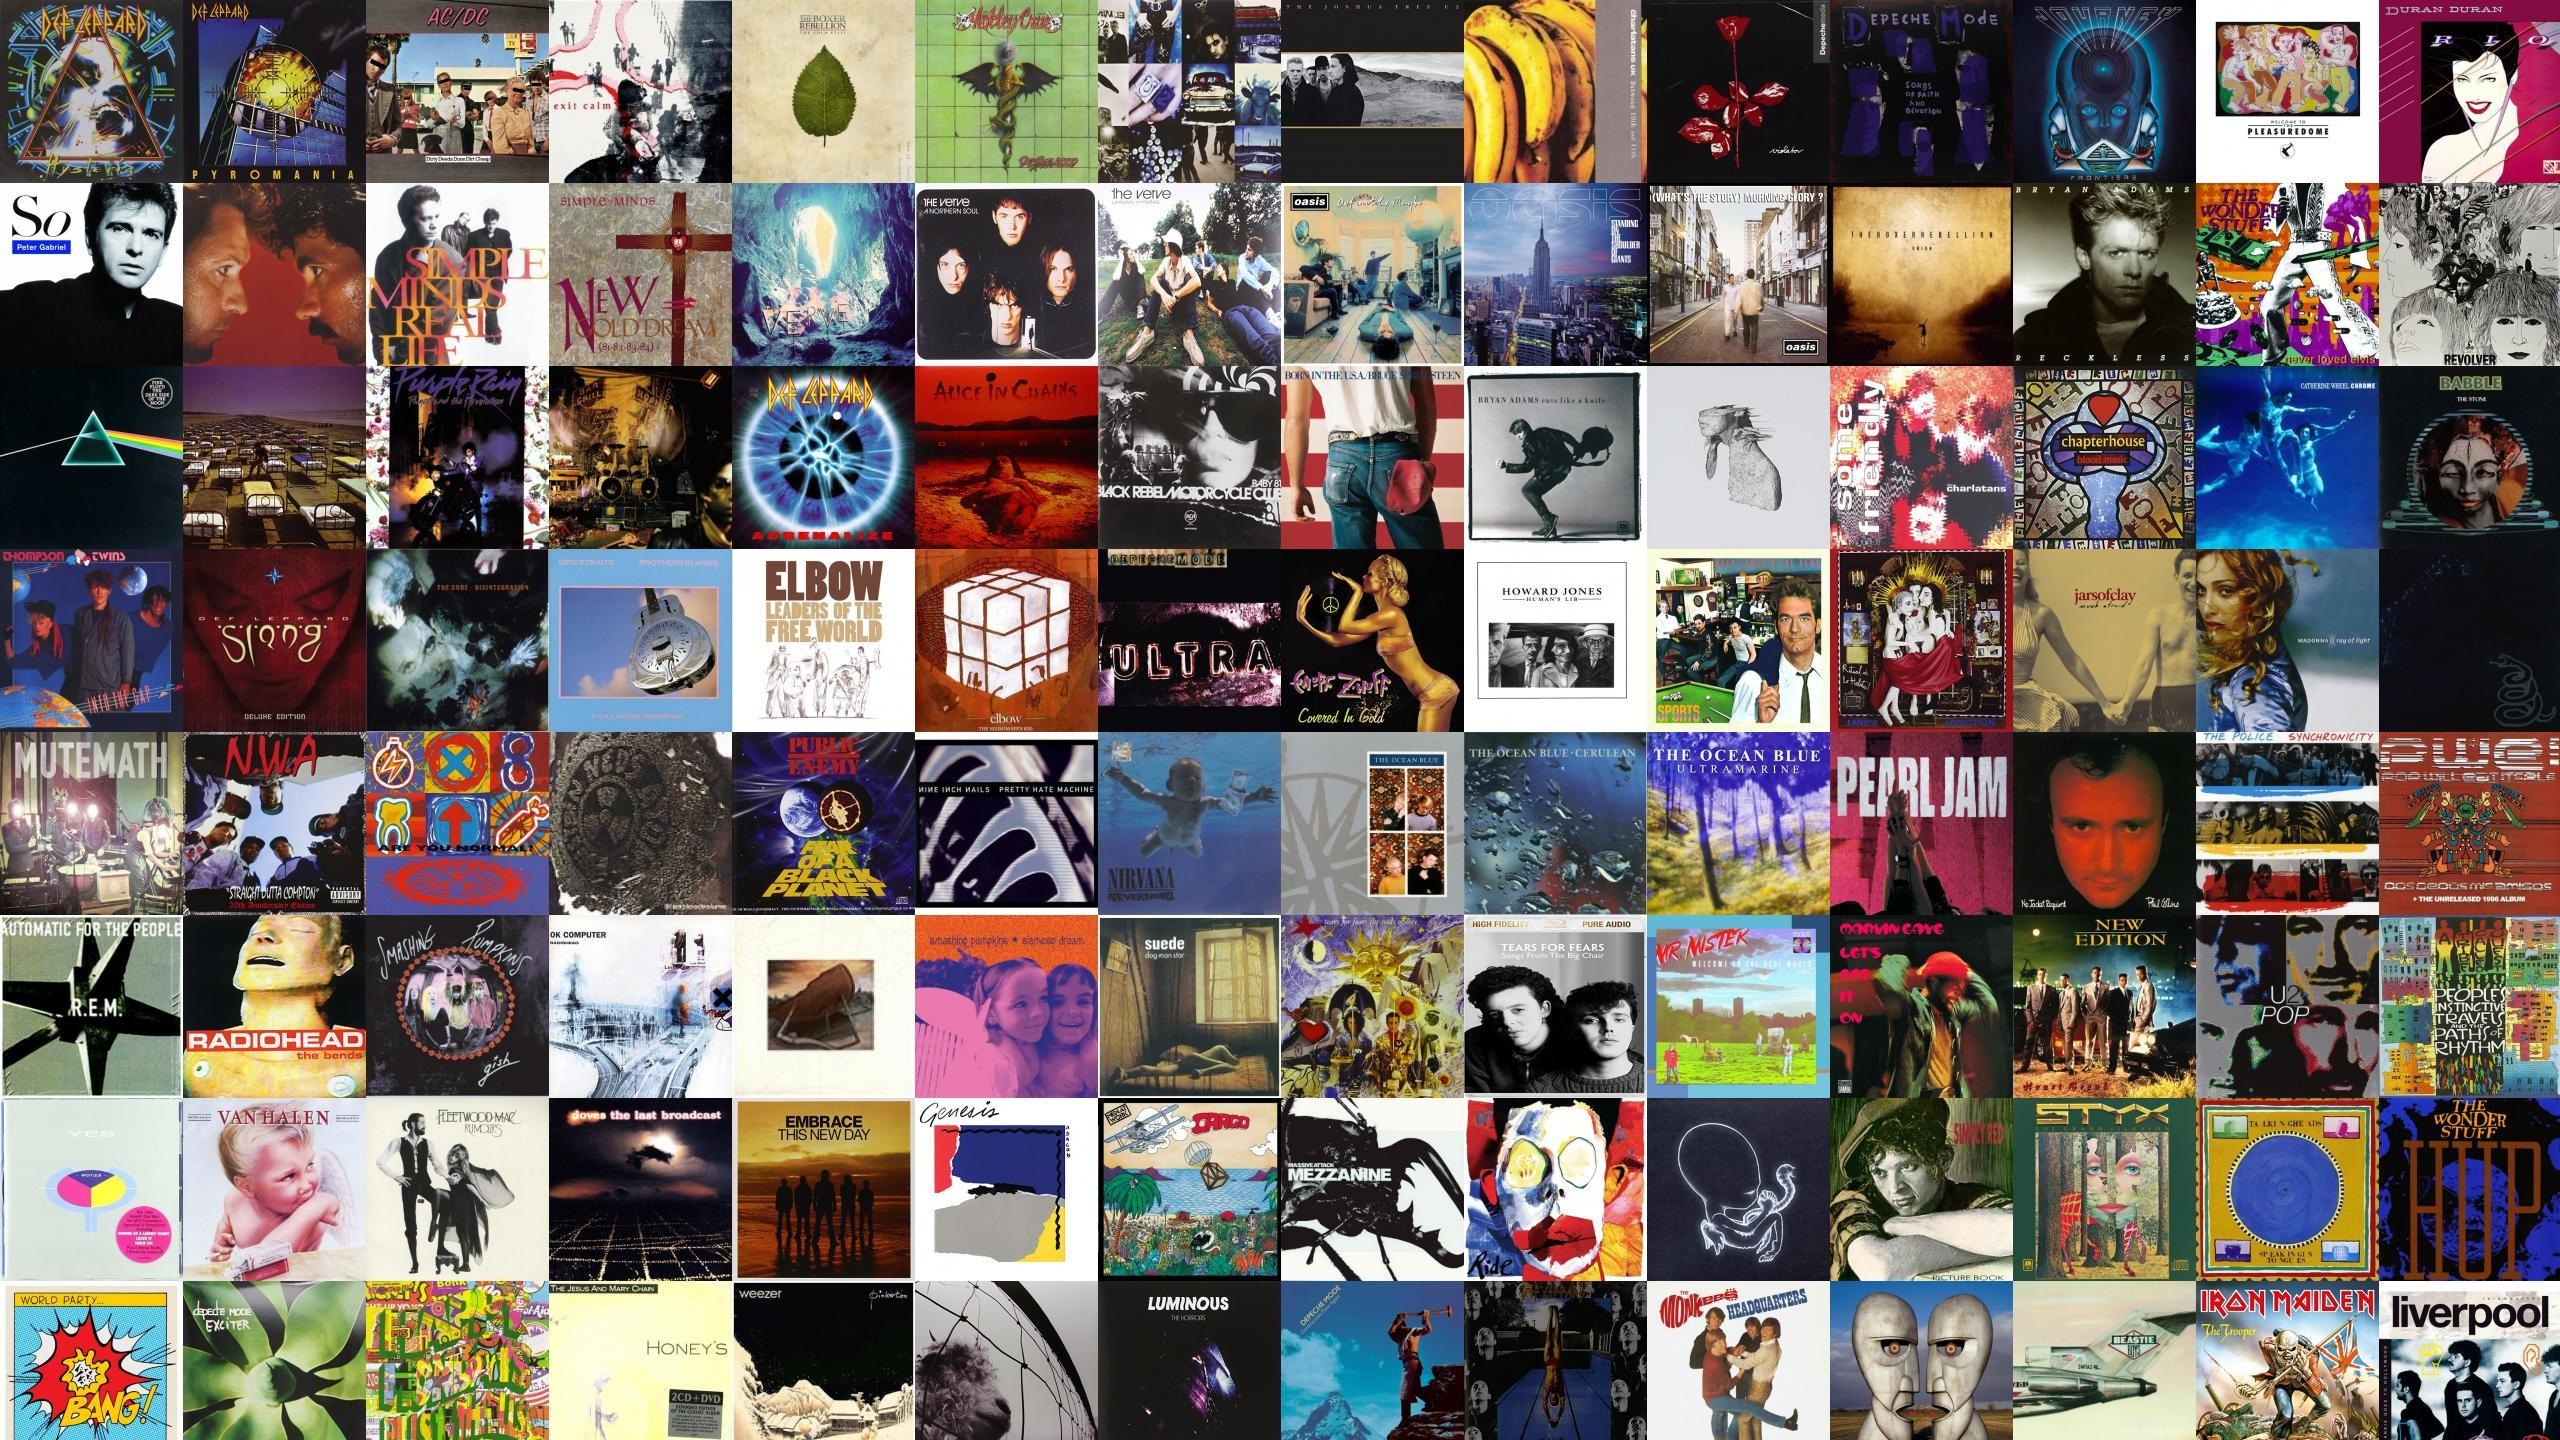 Res: 2560x1440, Def Leppard Hysteria Def Leppard Pyromania Acdc Wallpaper Â« Tiled Desktop  Wallpaper